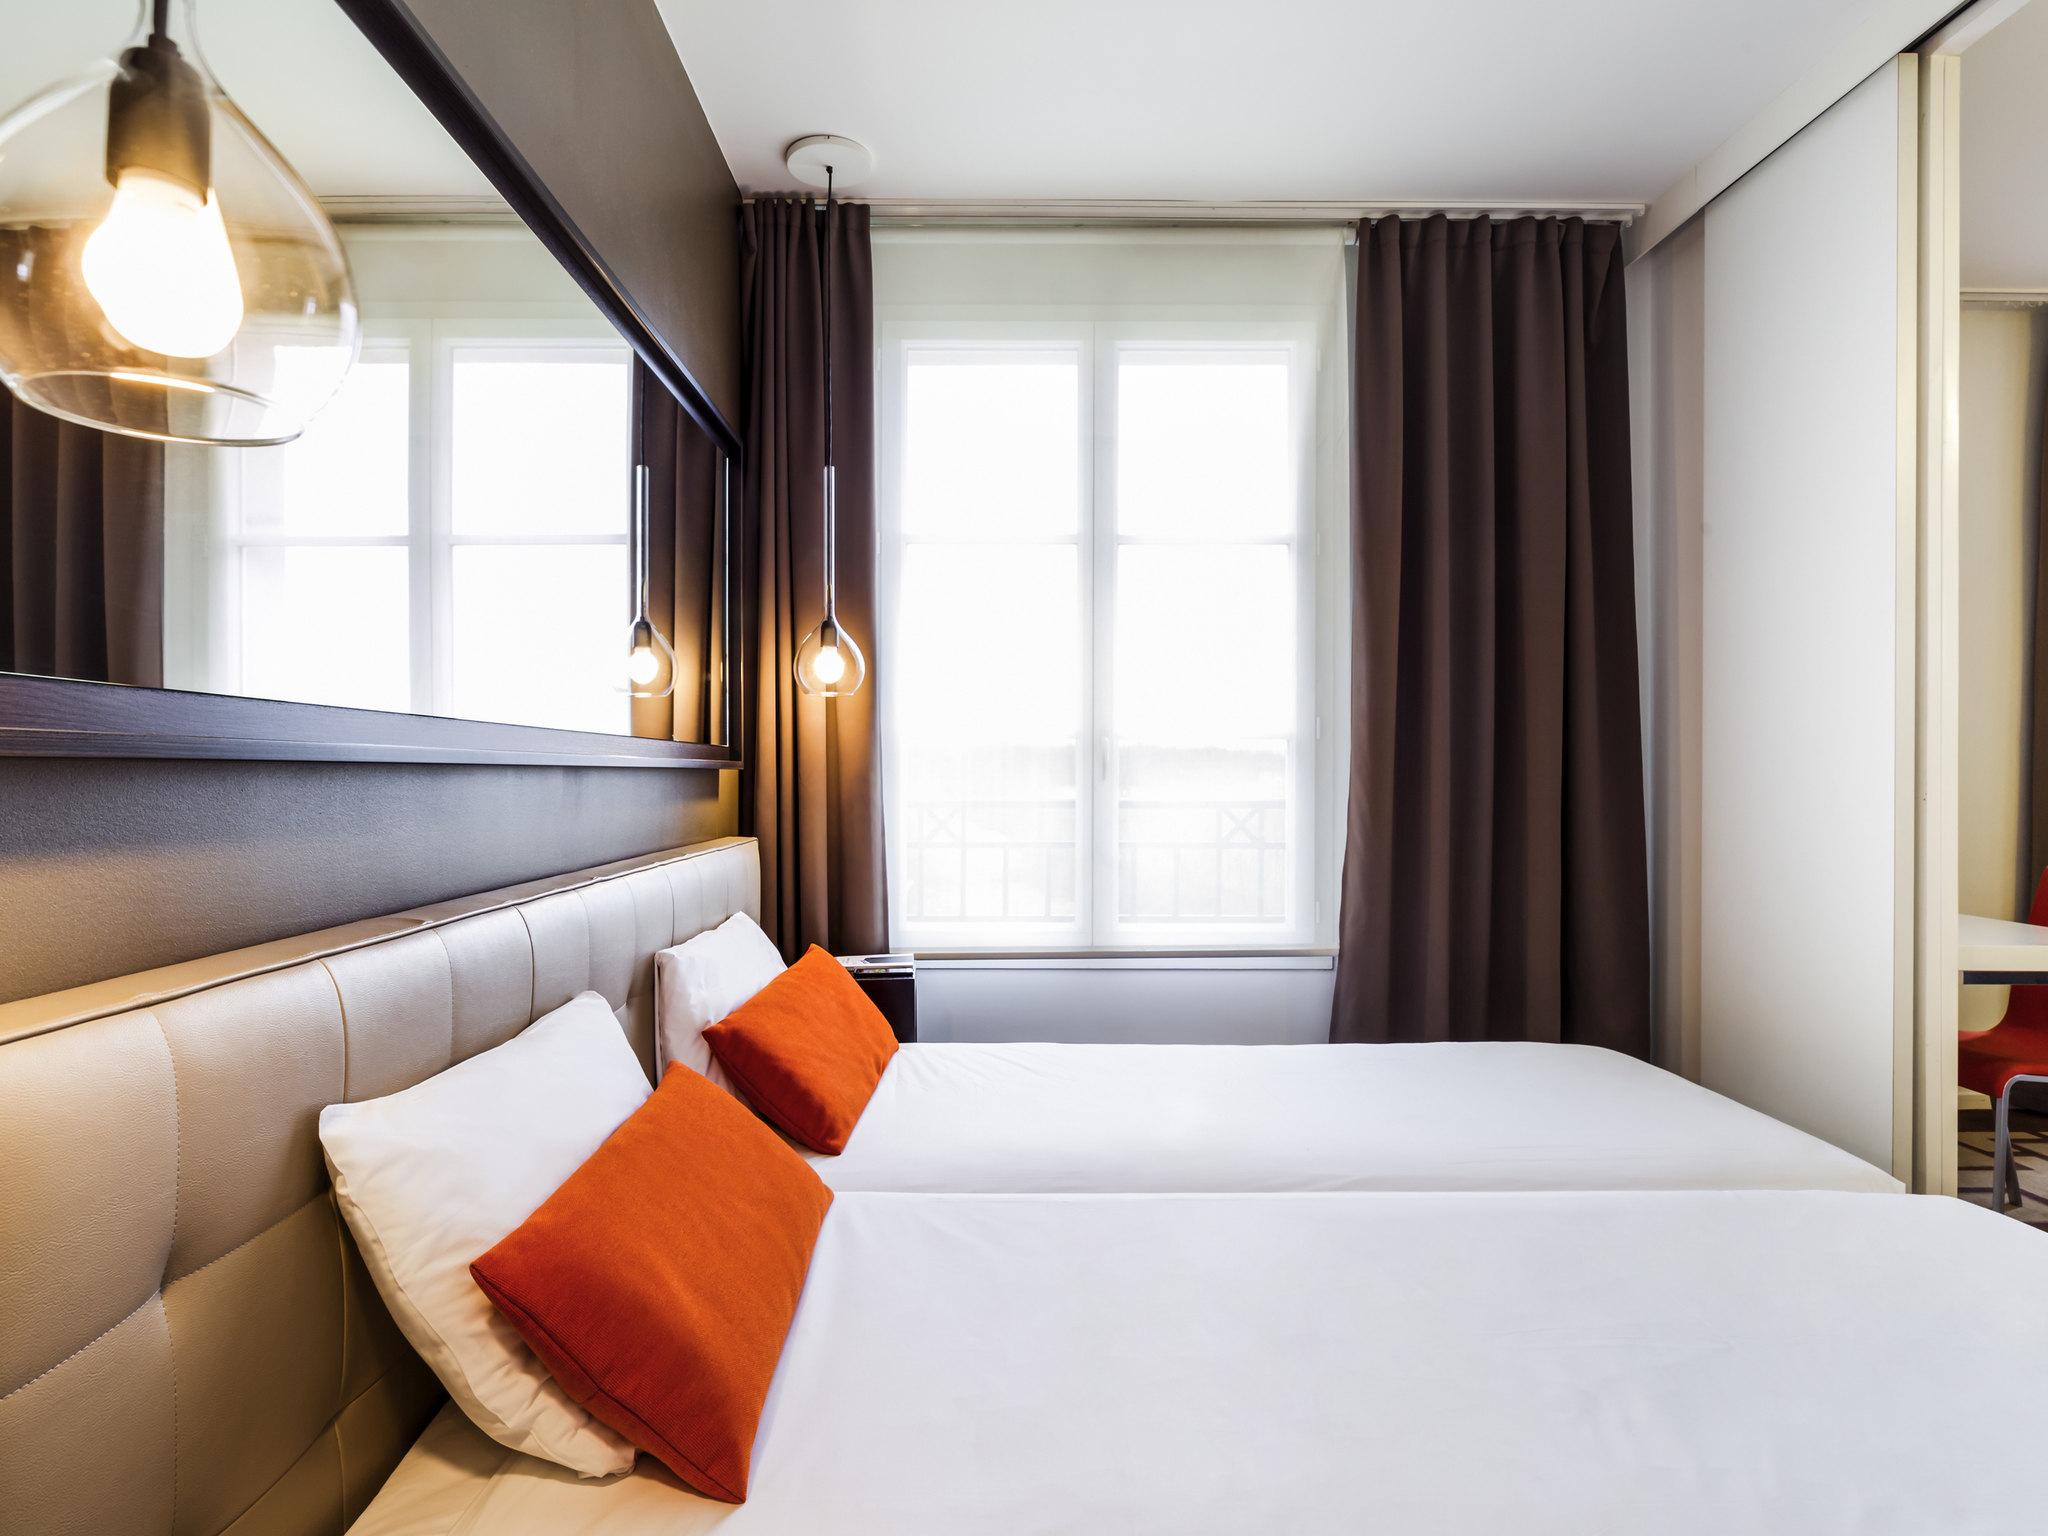 Hotel - Hipark by Adagio Marseille (Eröffnung: Februar 2018)